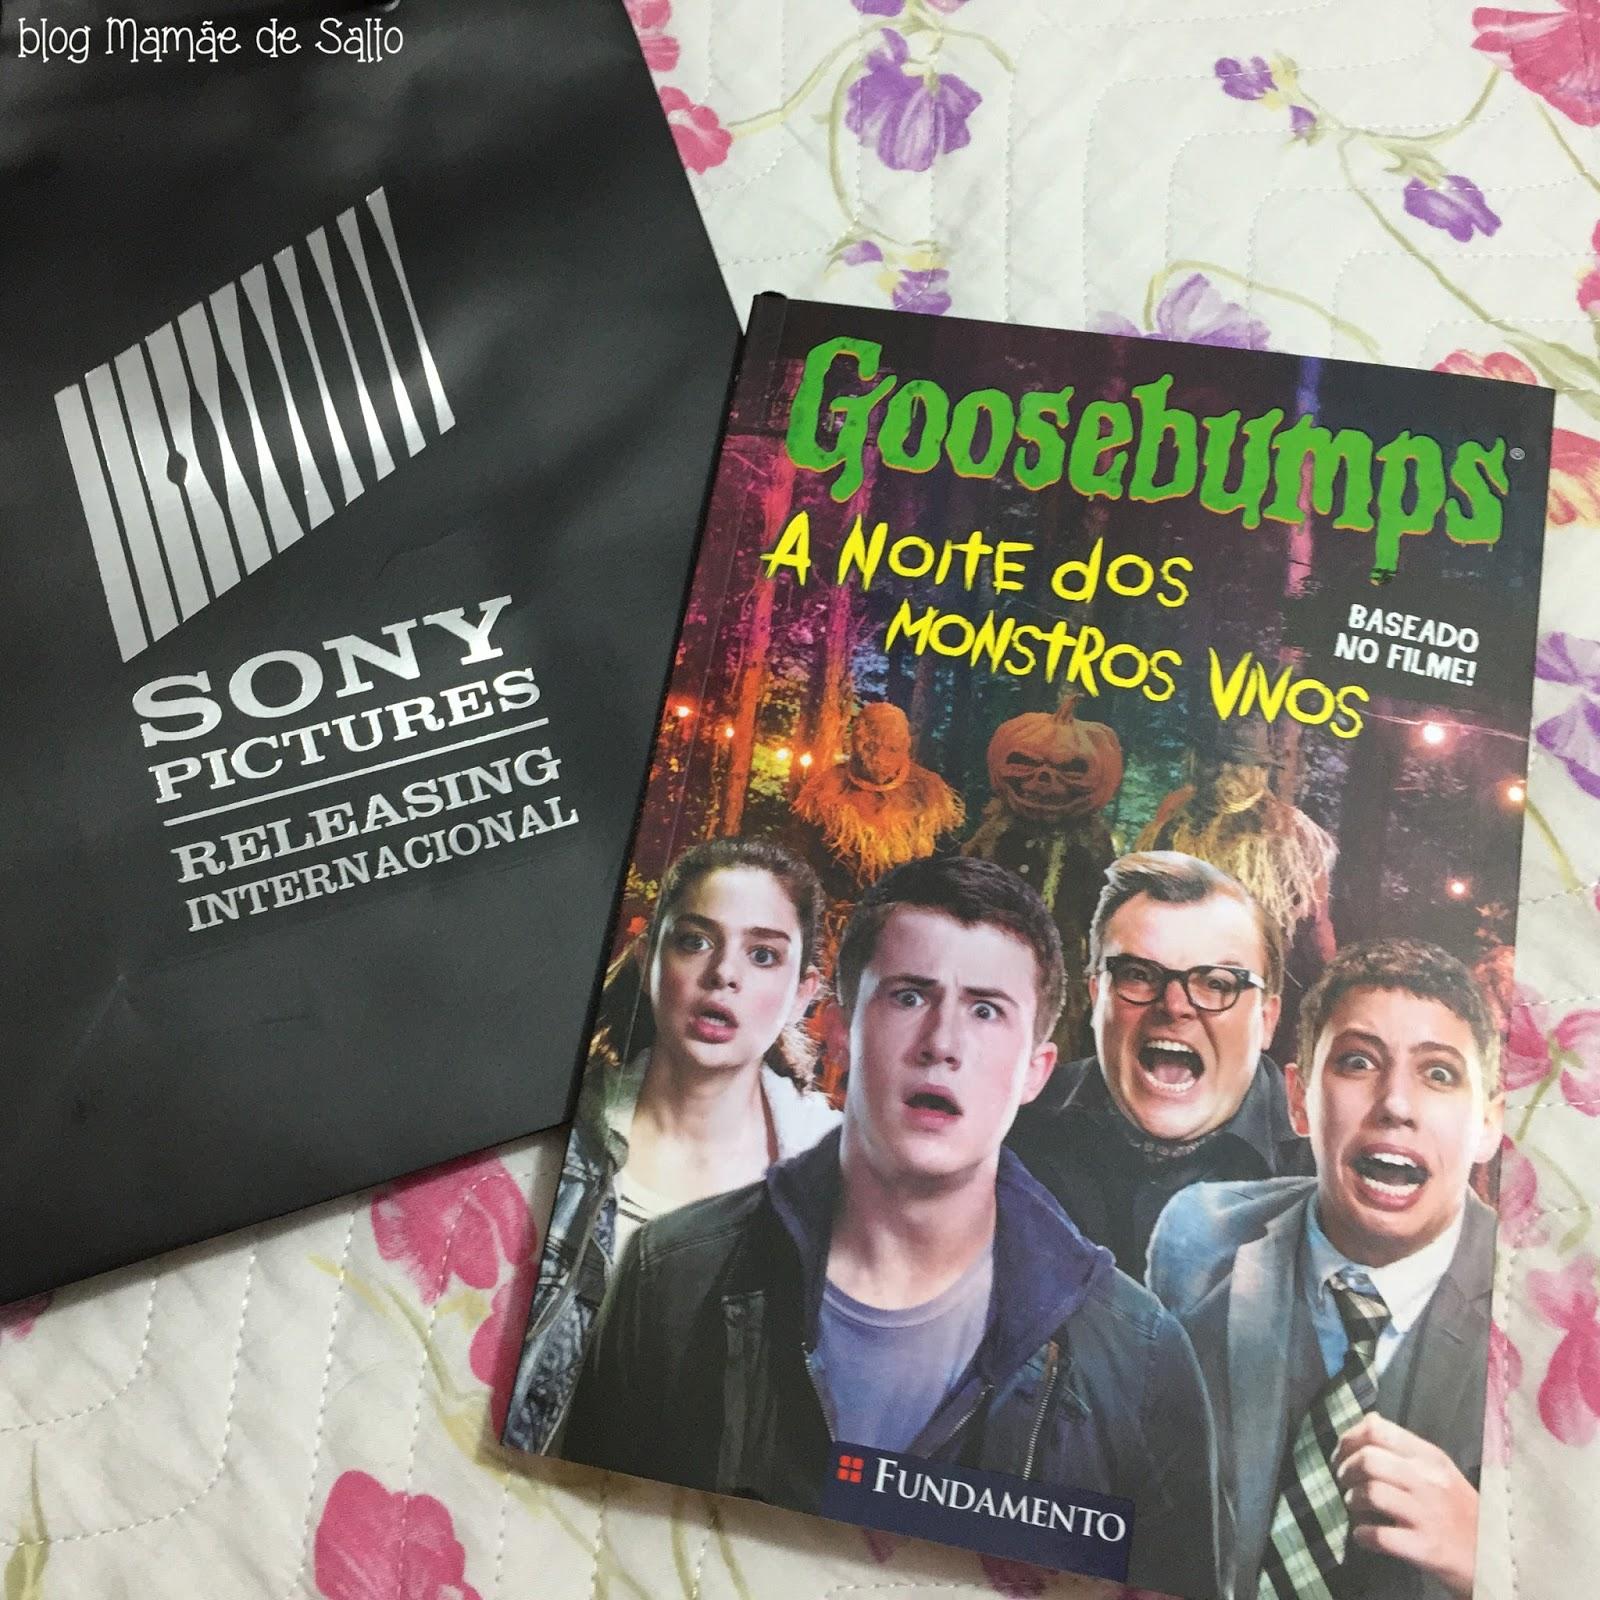 livro Goosebumps - A Noite dos Monstros Vivos, ed. Fundamento => blog Mamãe de Salto